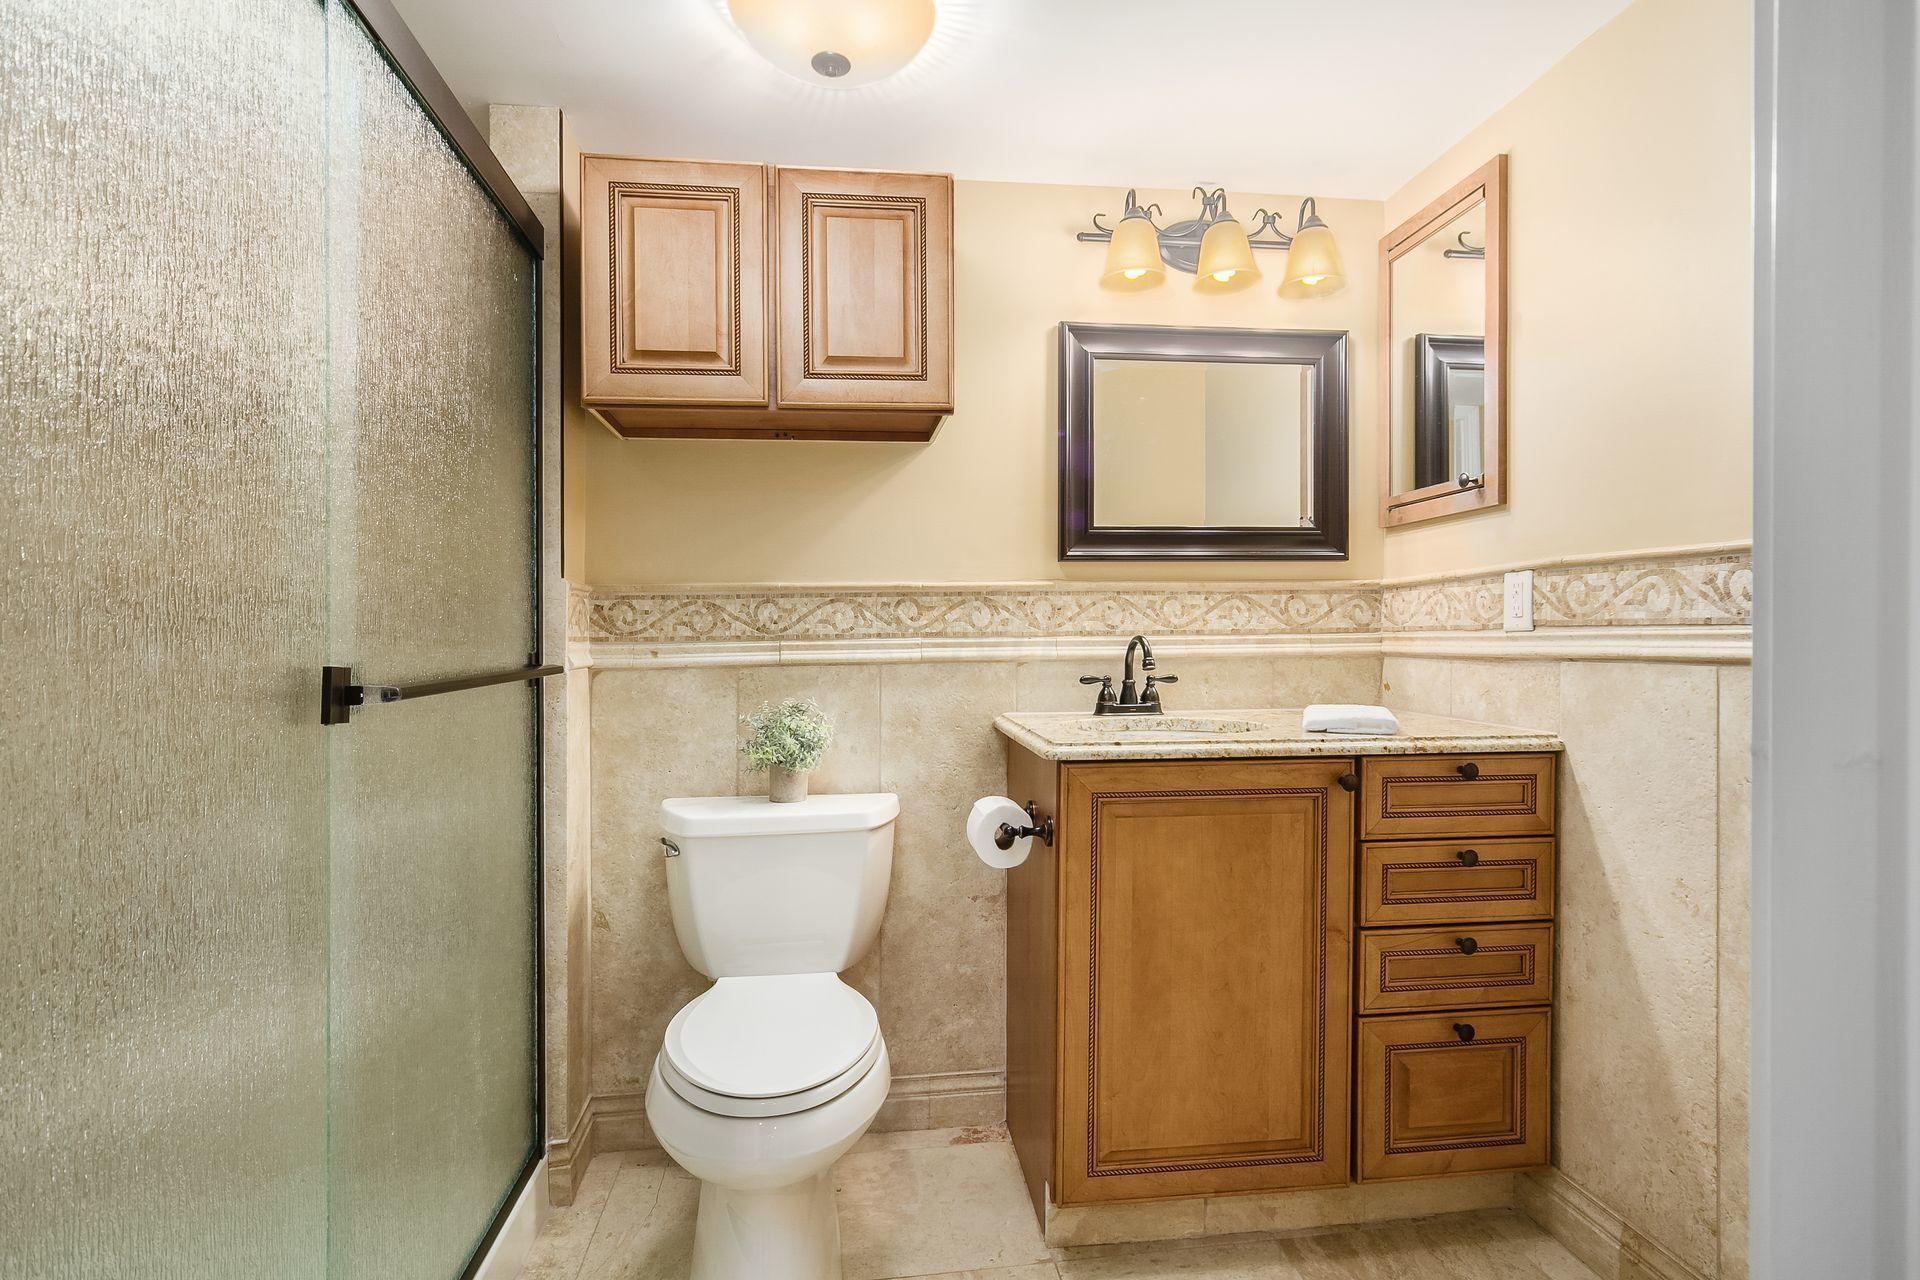 5920 Trafalgar Lane, Dublin, Ohio 43016, 4 Bedrooms Bedrooms, ,5 BathroomsBathrooms,Residential,For Sale,Trafalgar,220040211